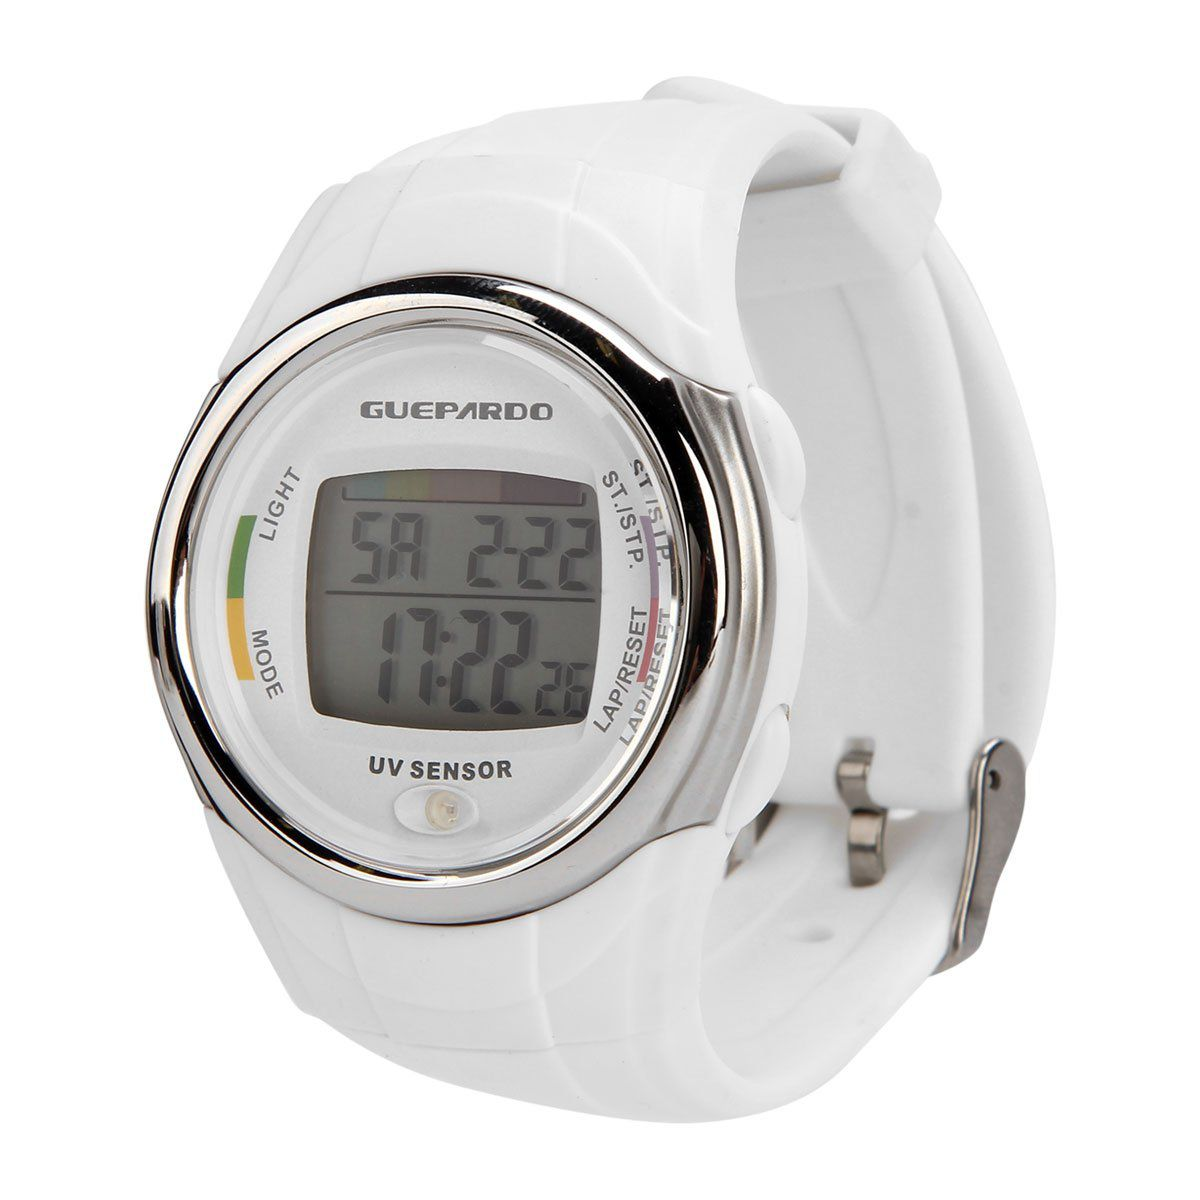 Relógio Guepardo UV Master Branco